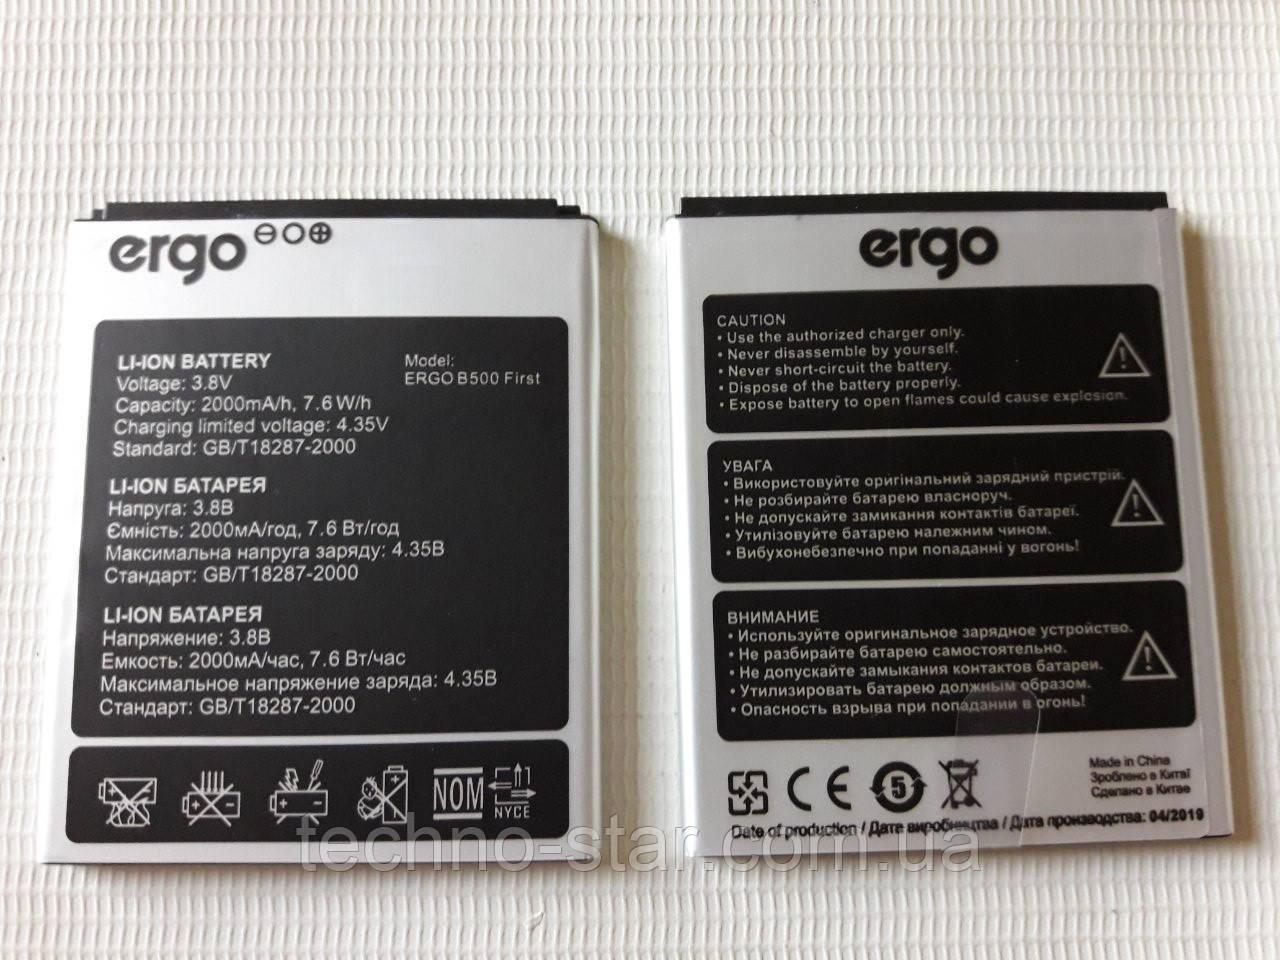 Оригинальный аккумулятор ( АКБ / батарея ) для Ergo B500 First 2000mAh